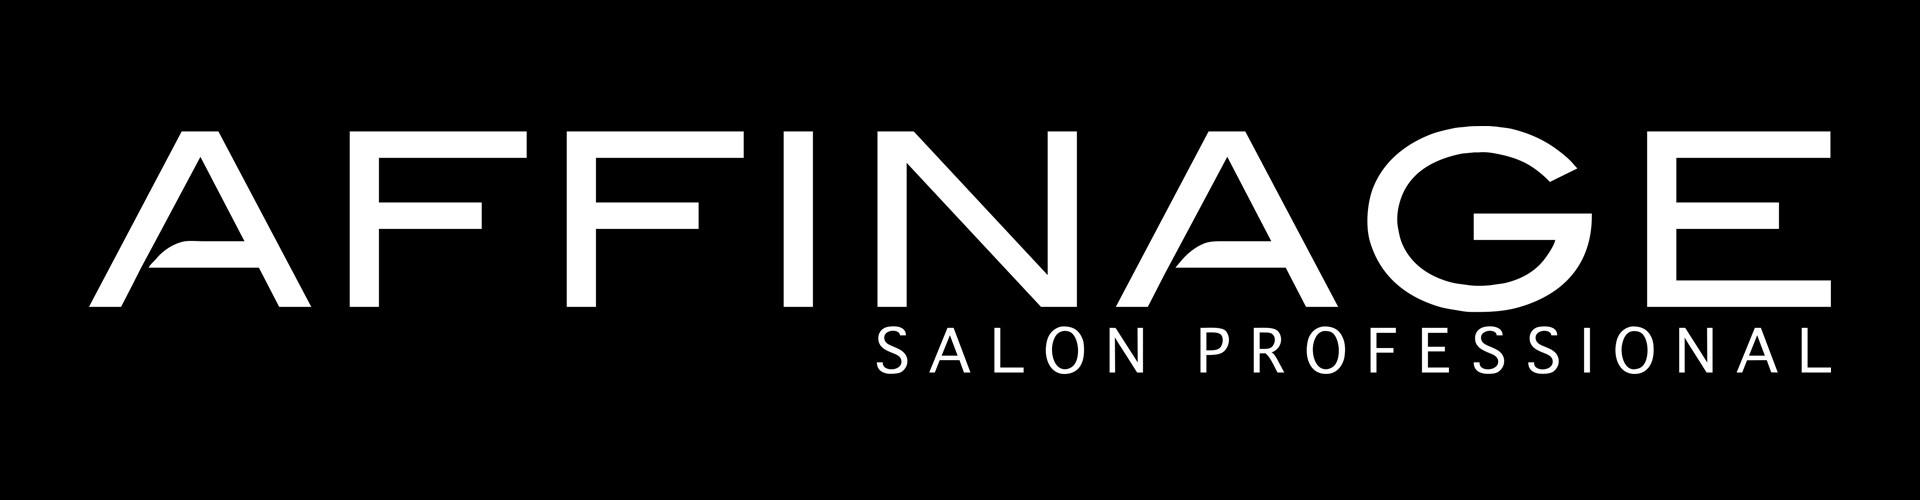 Affinage Salon Professional